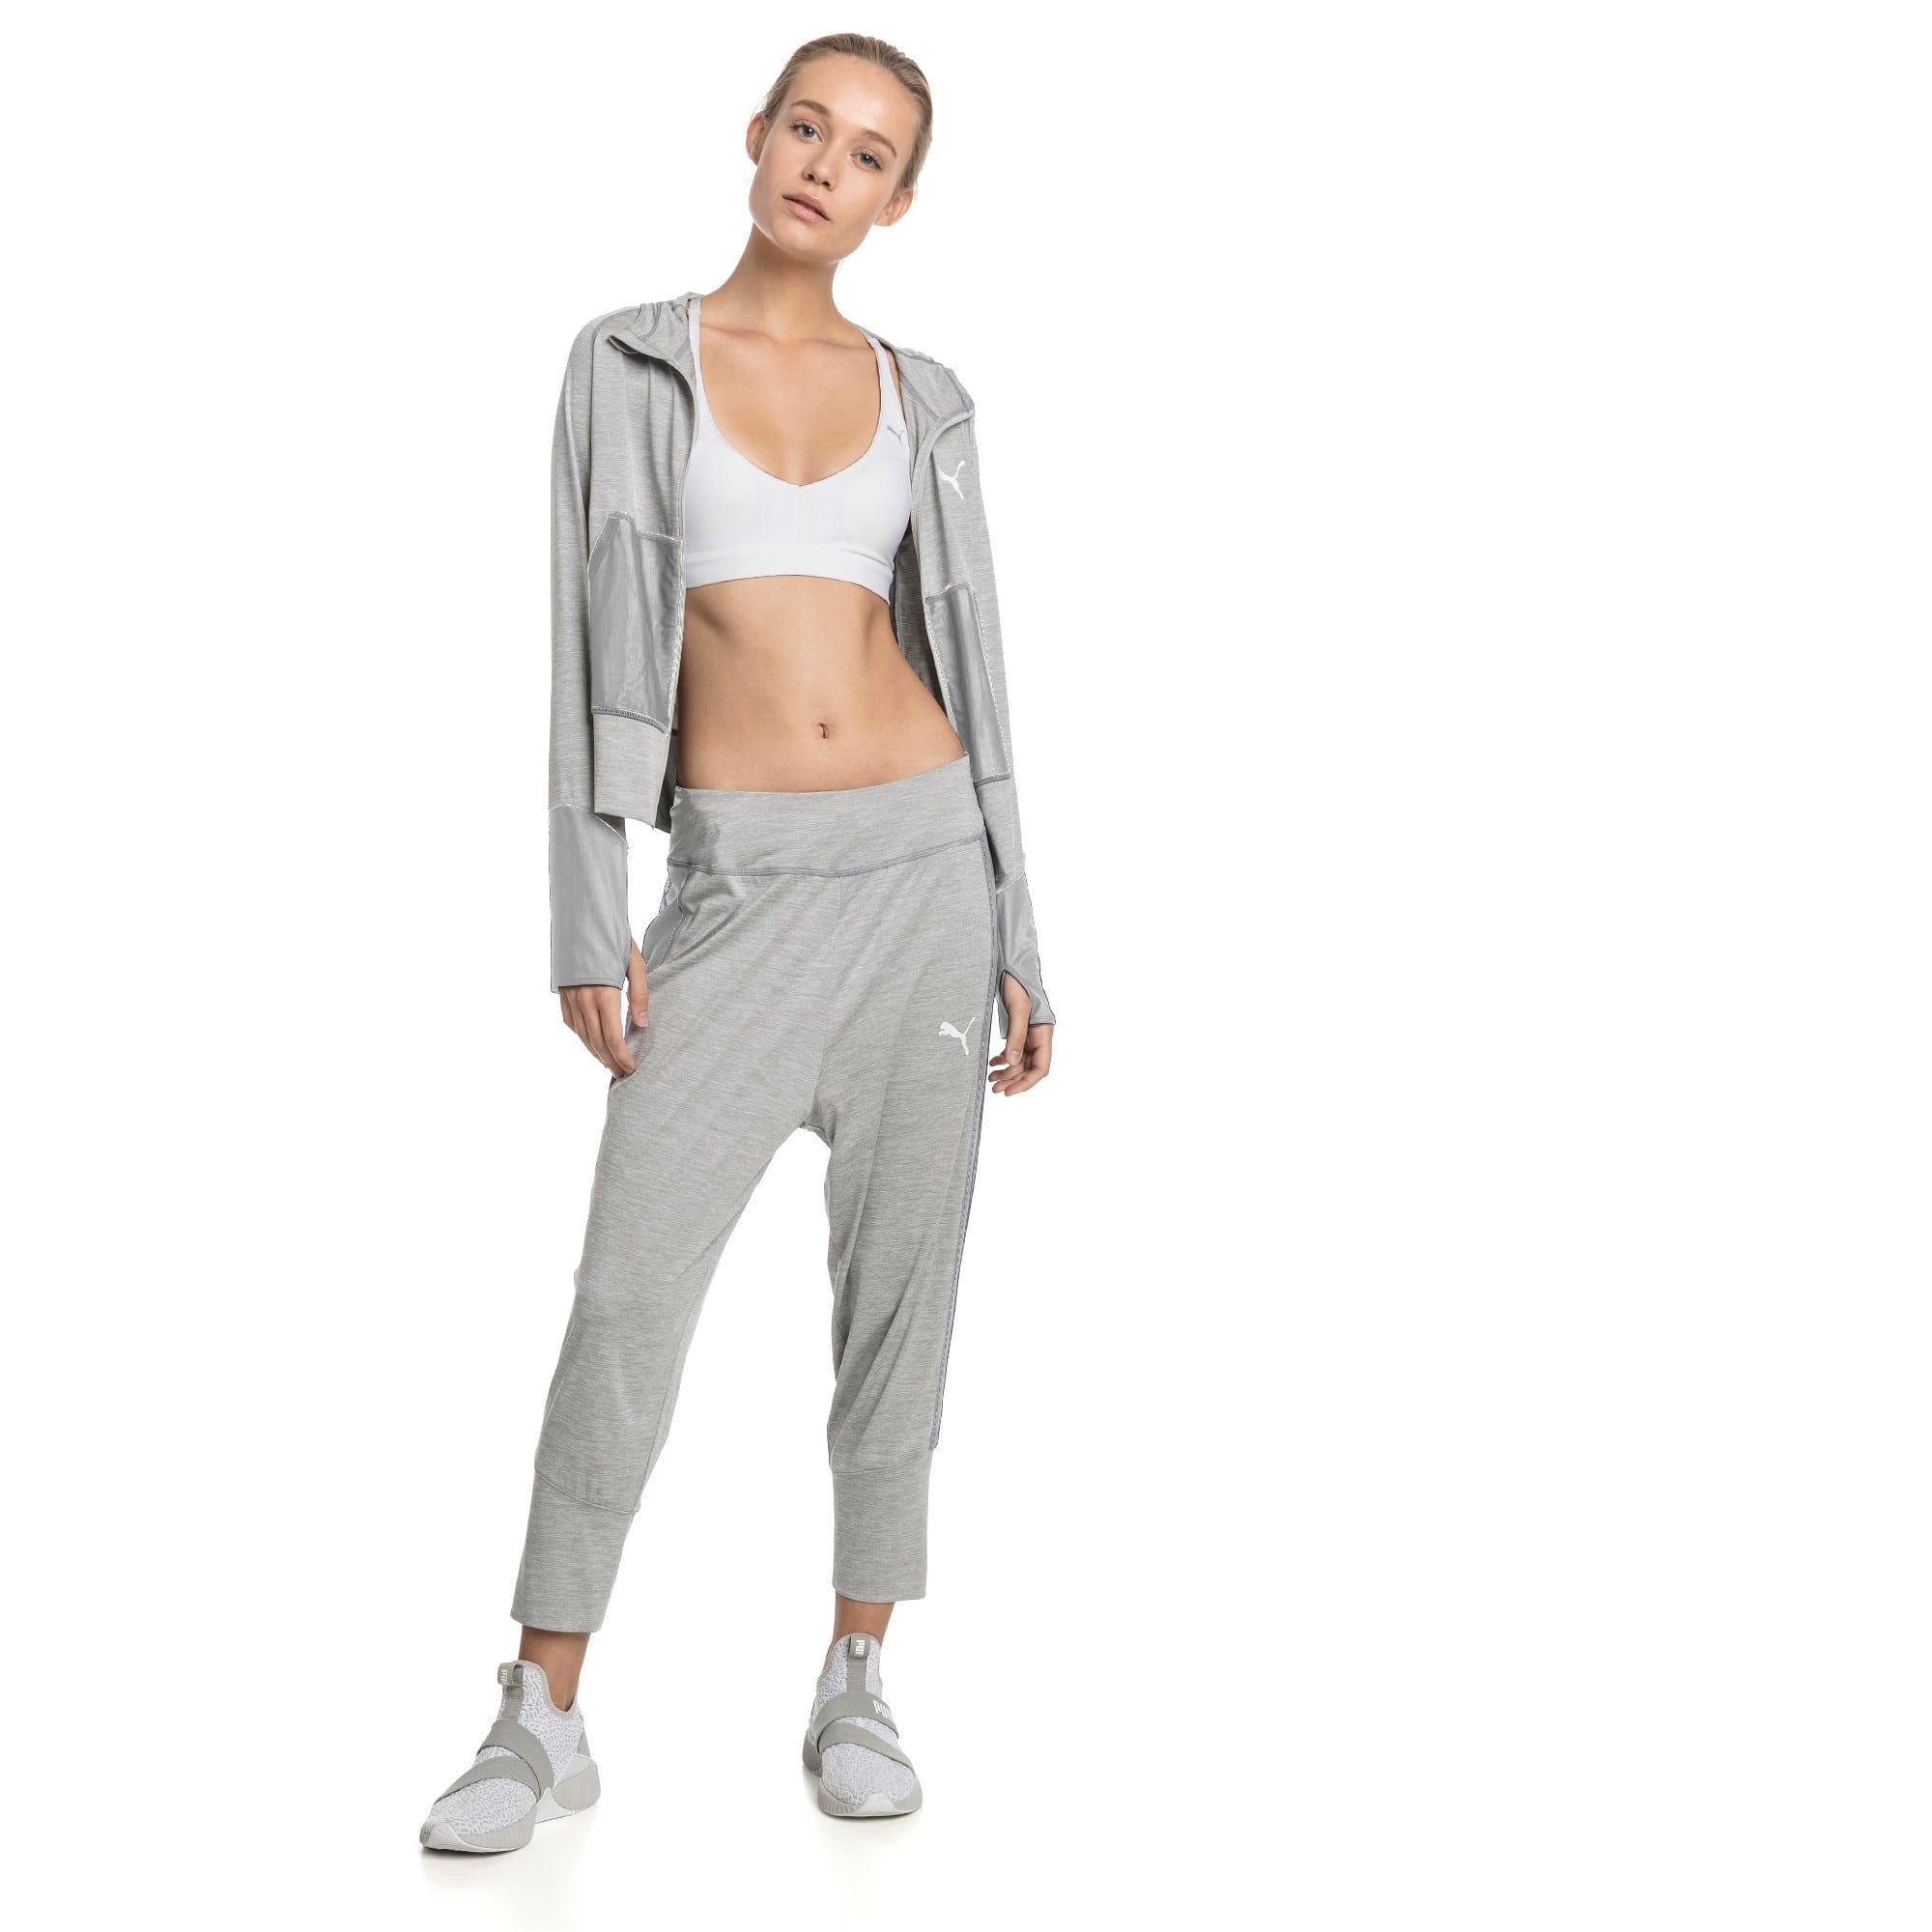 Thumbnail 3 of Knockout Woven Women's 3/4 Pants, Light Gray Heather, medium